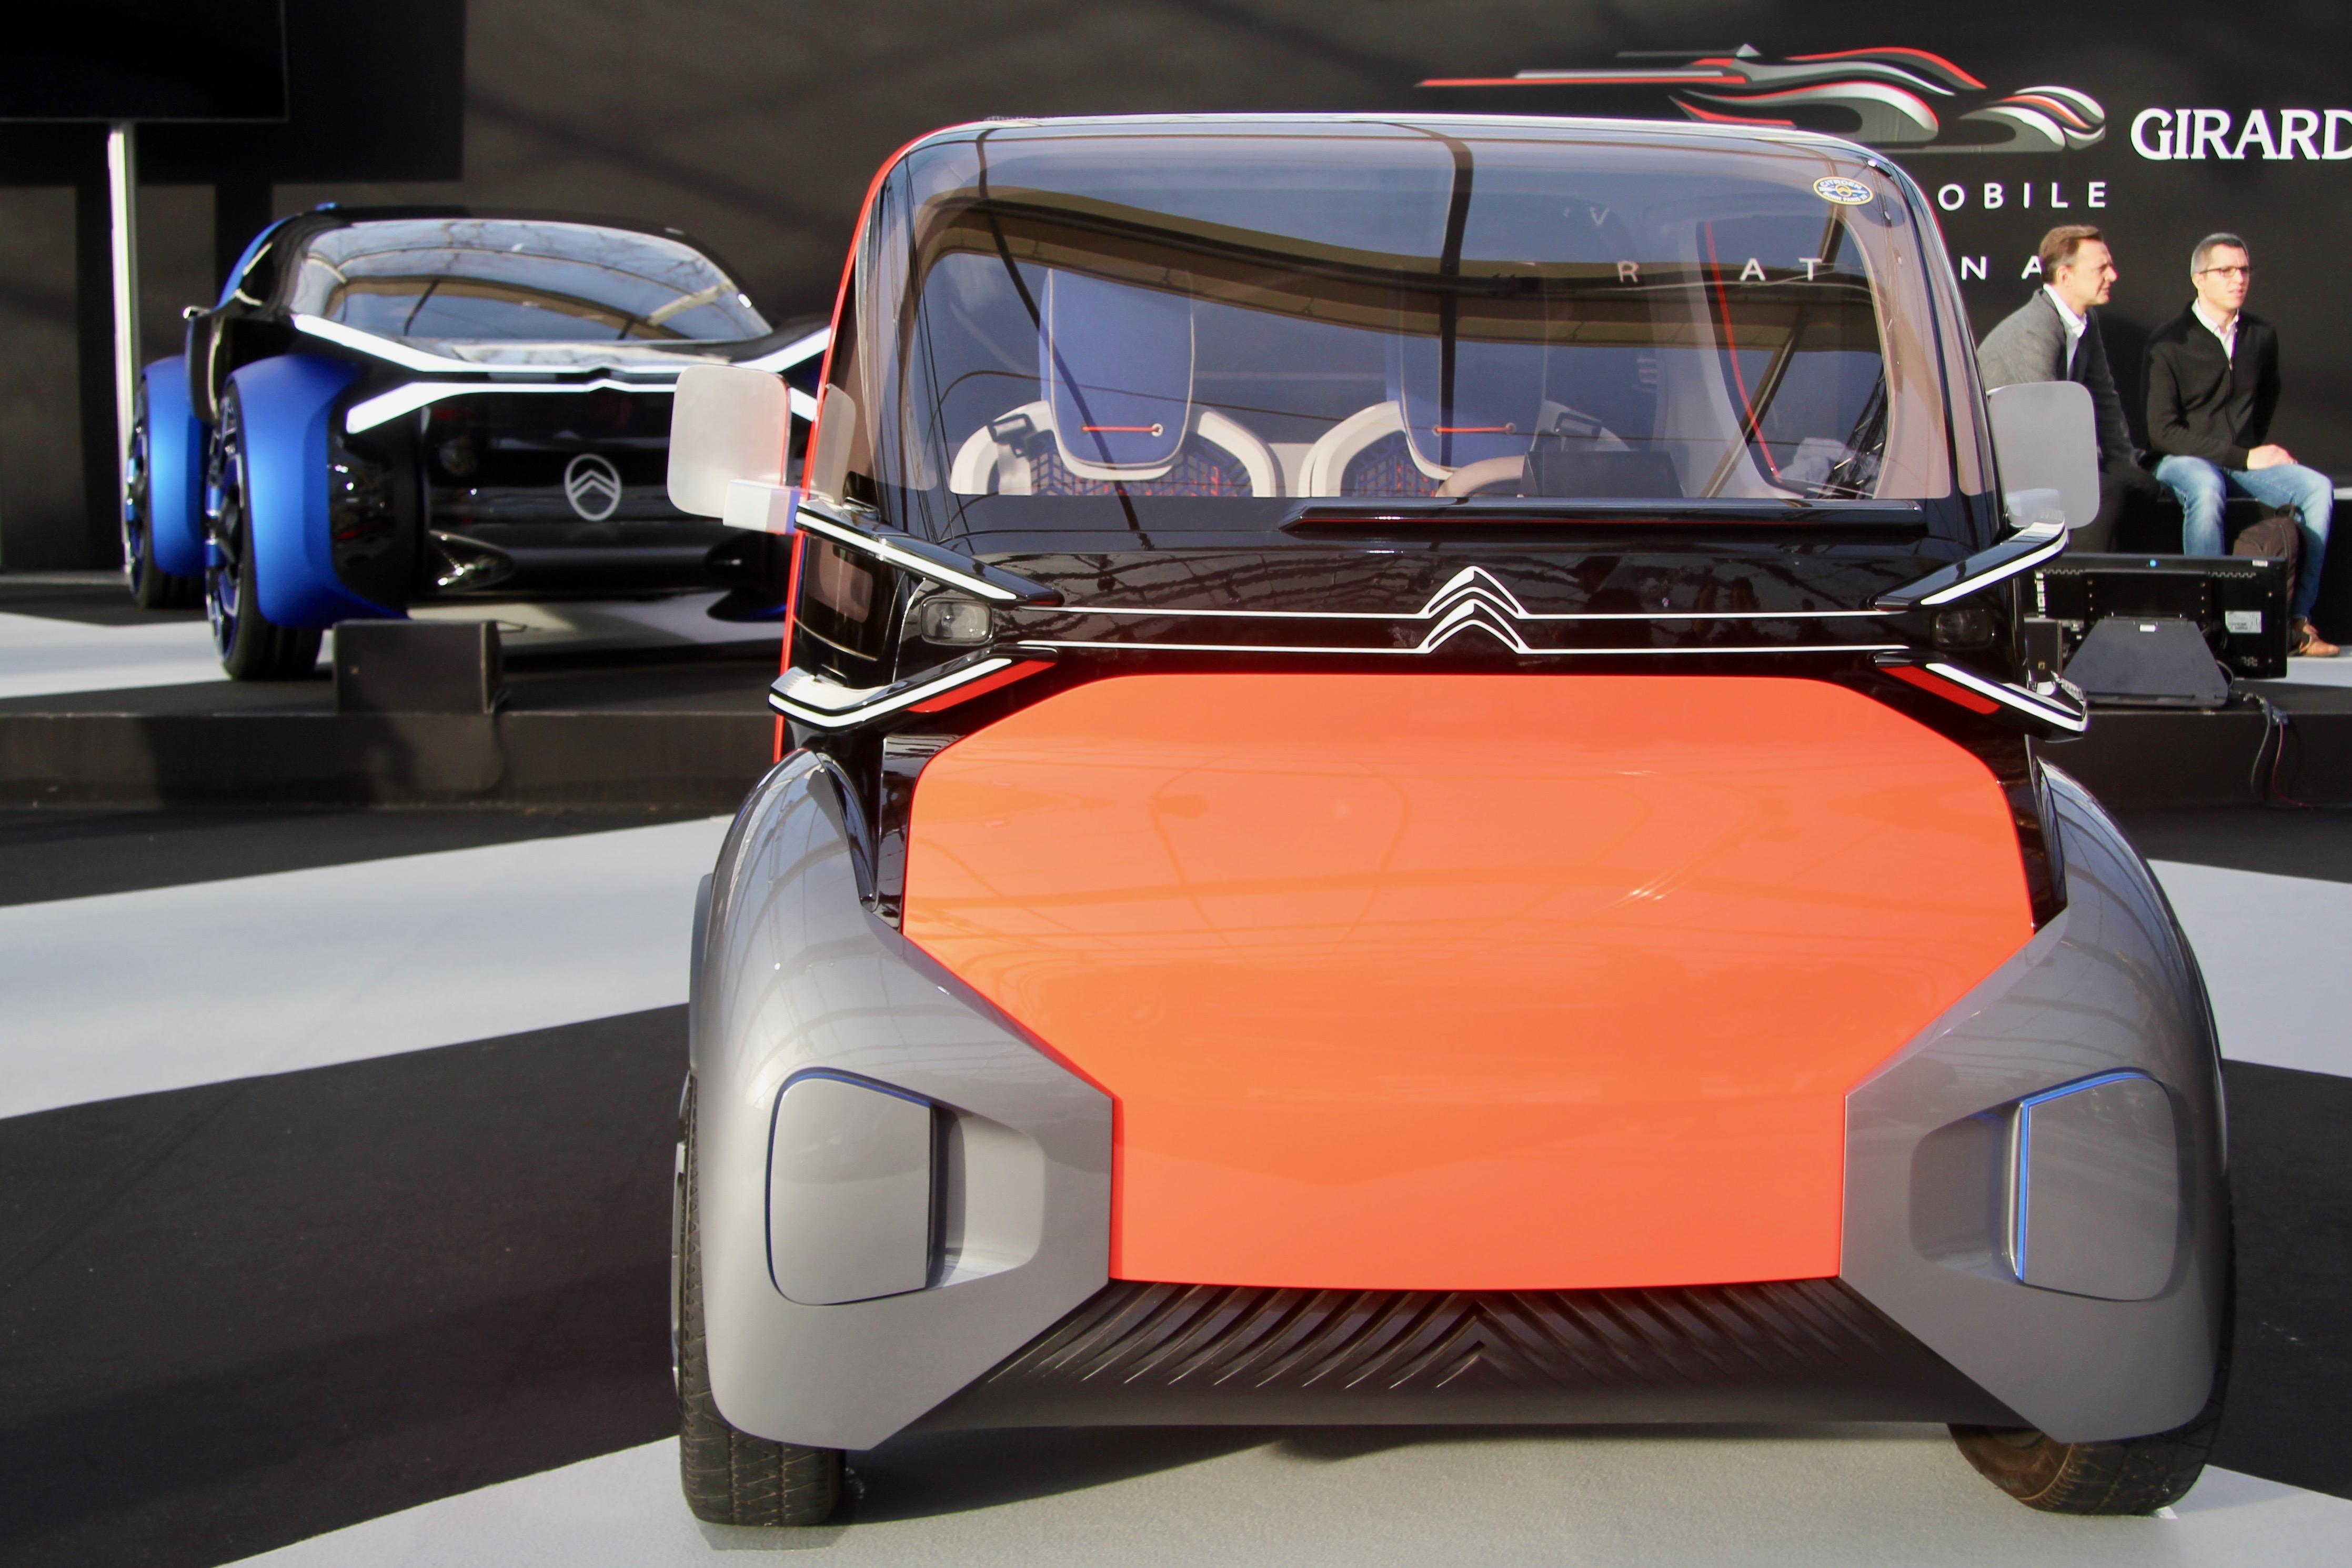 Citroën Ami One concept - front face / face avant - Festival Automobile International - 2020 - exposition Concept Cars - Design Automobile - photo Ludo Ferrari